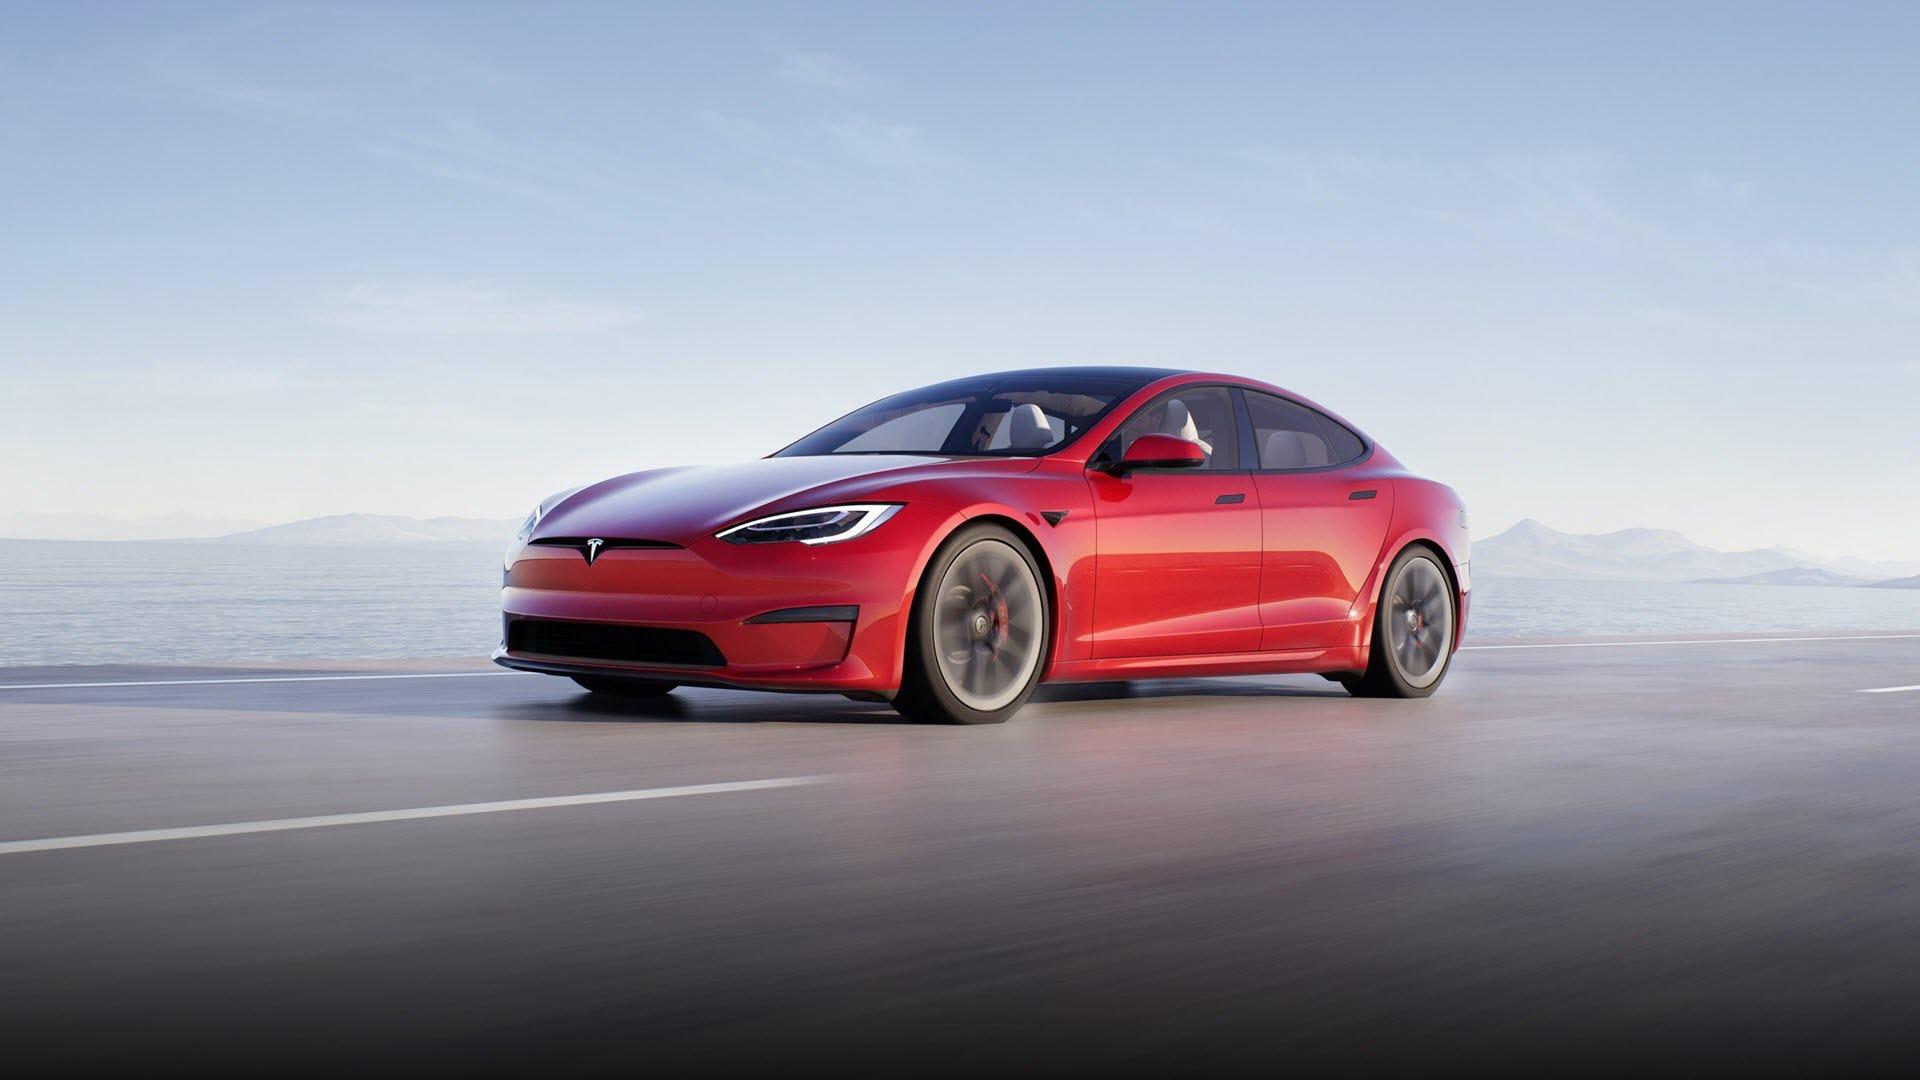 A red Tesla Model S car.